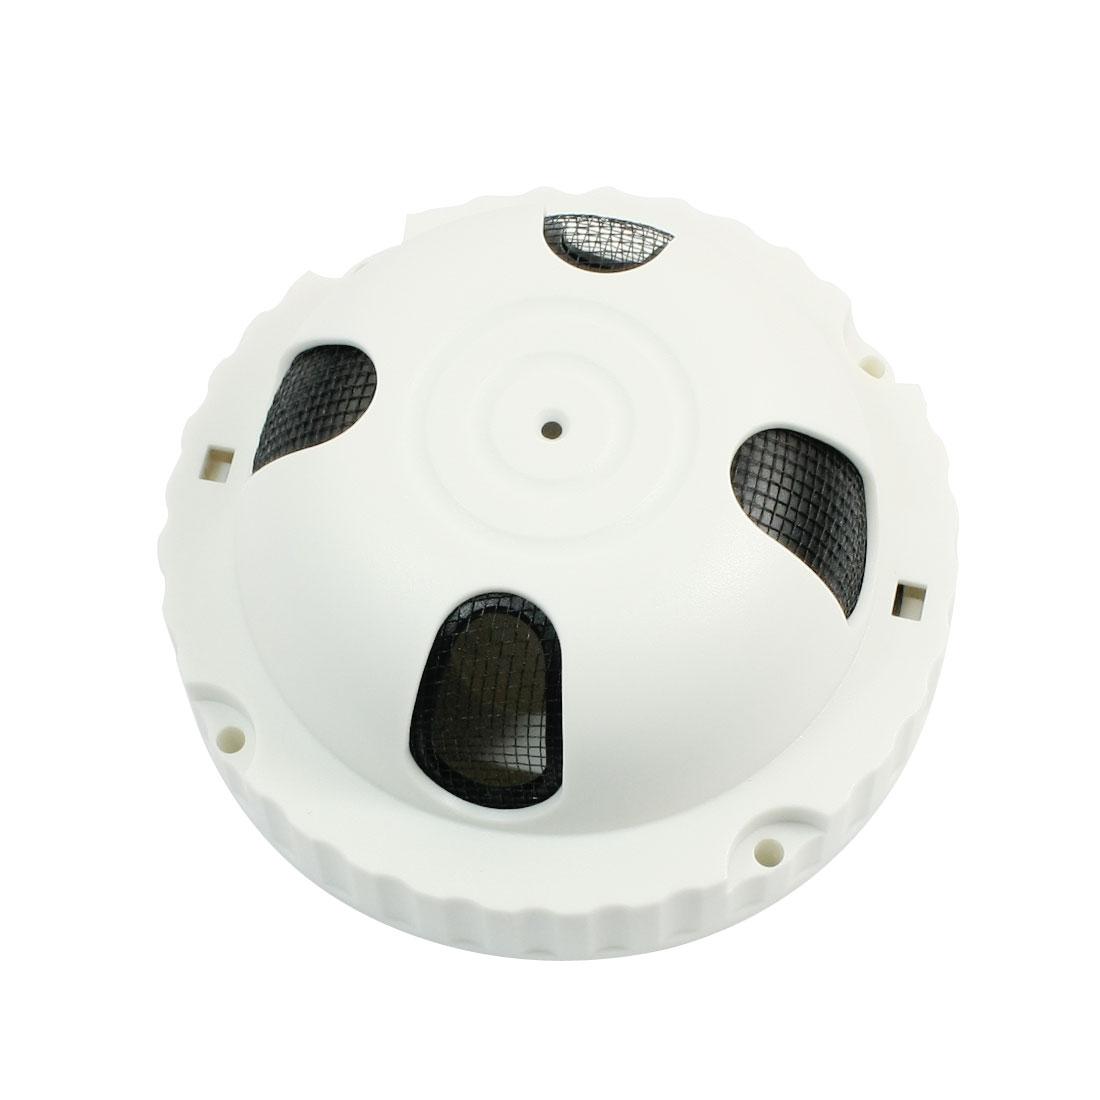 "Indoor Ceiling Mount CCD Dome Camera Plastic Housing 4.3"" Diameter"